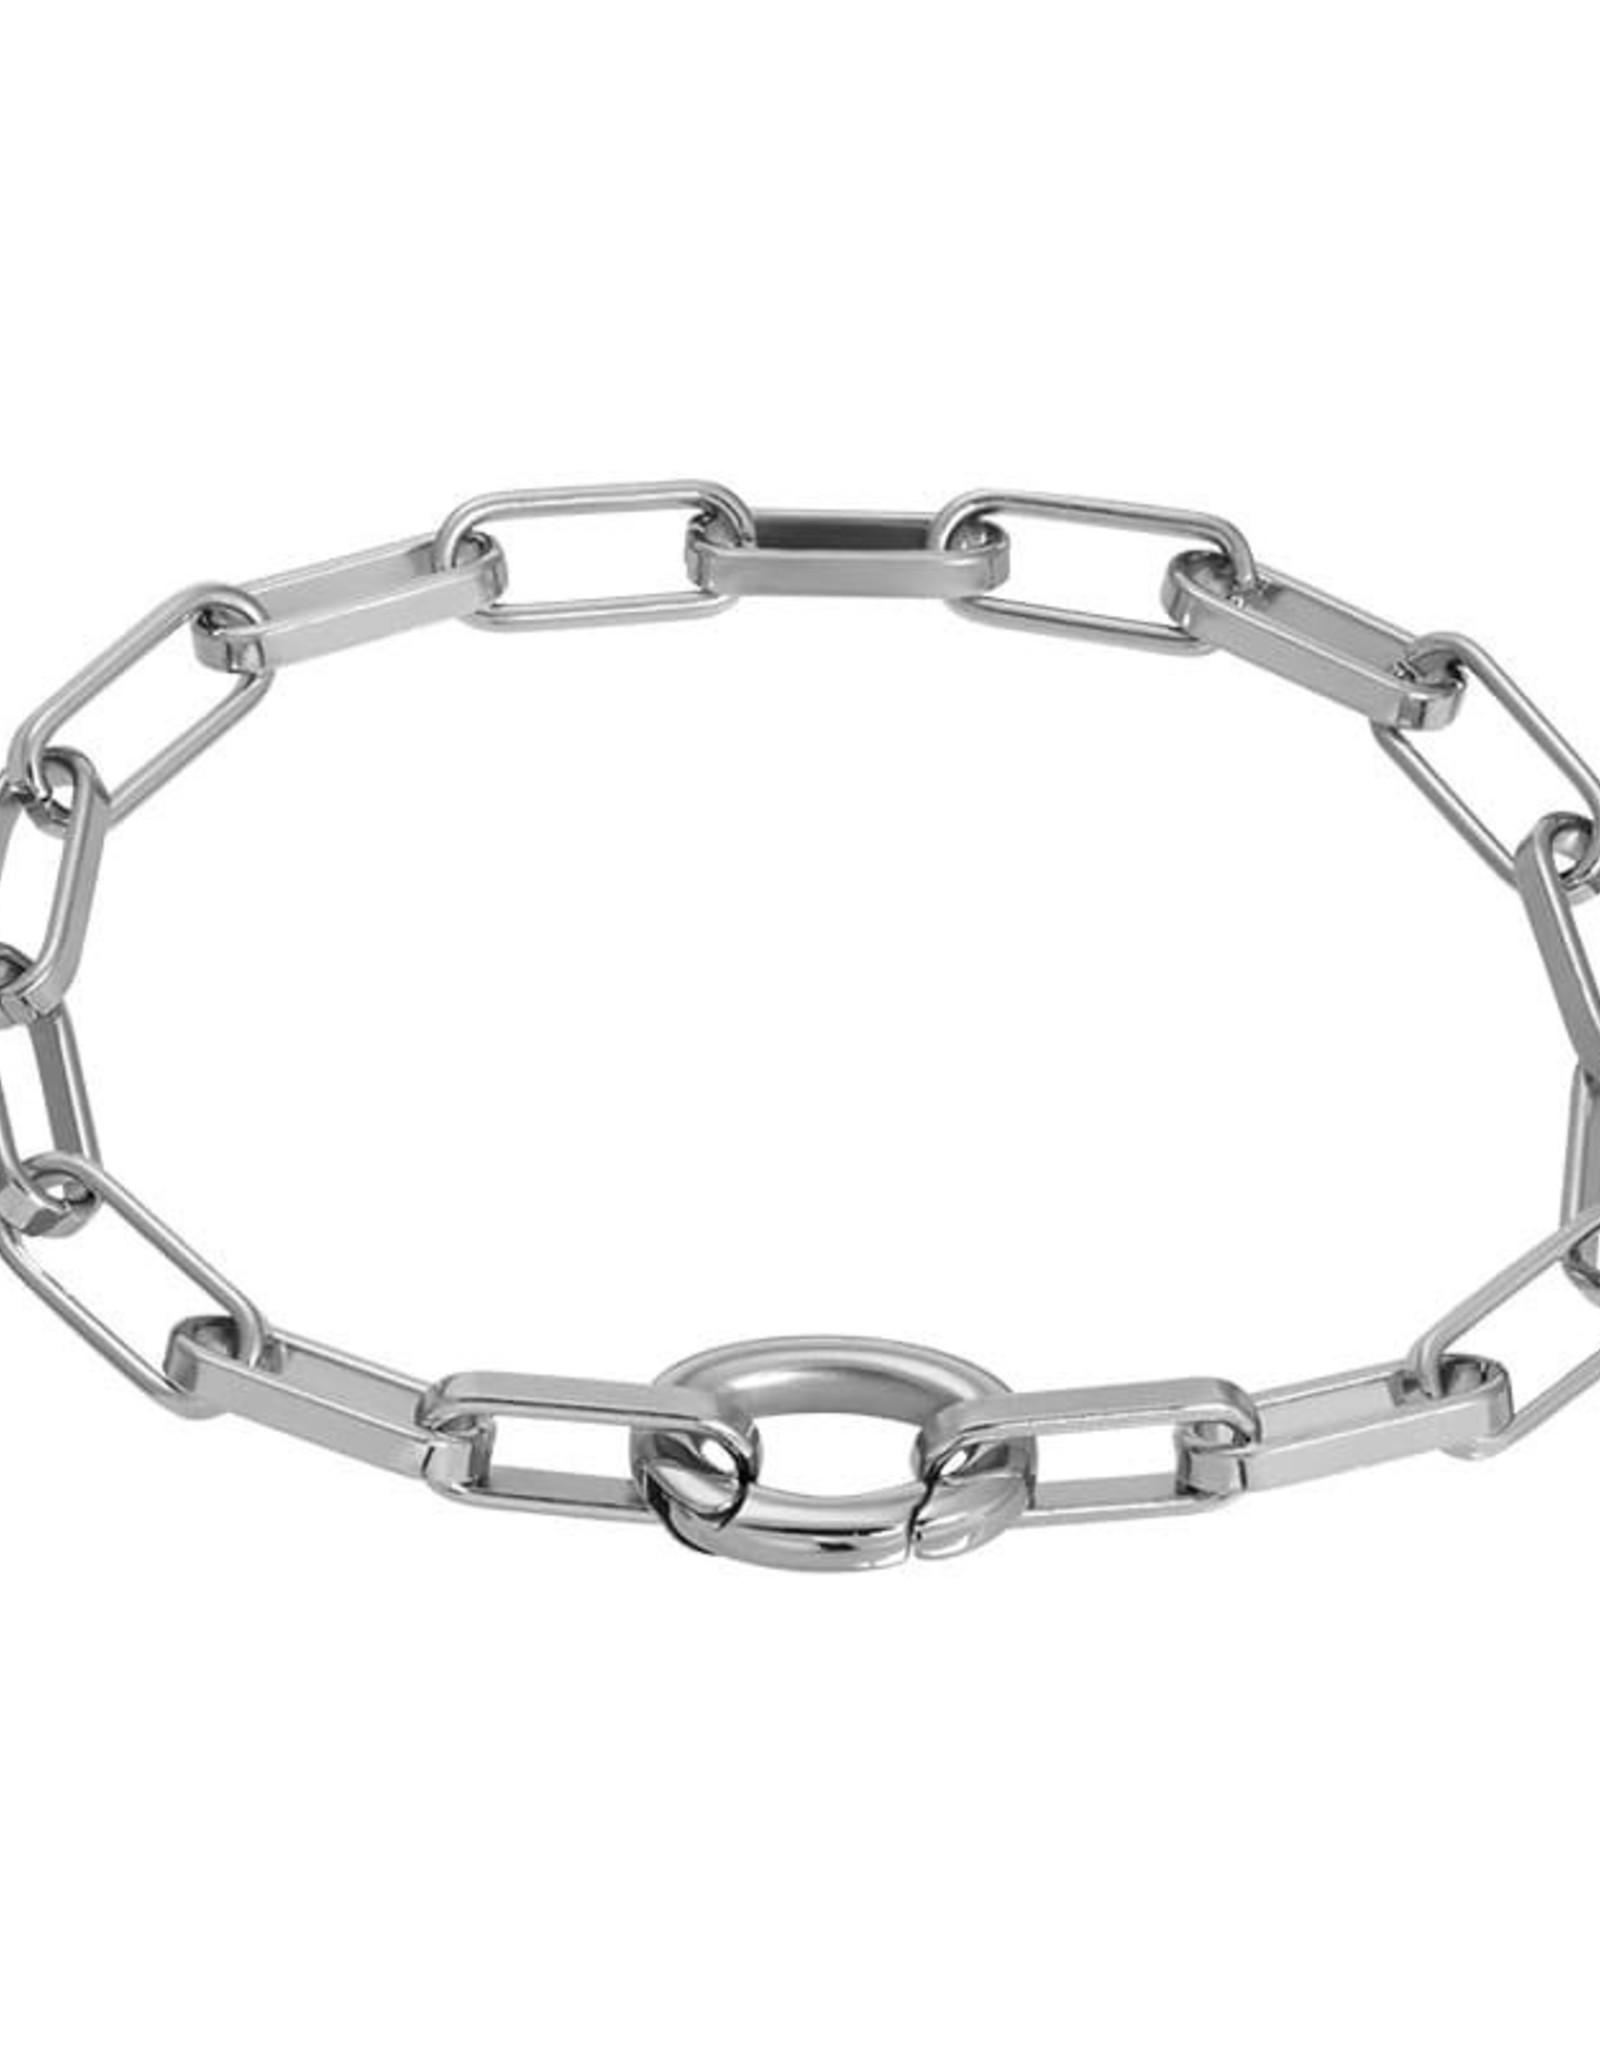 Silver Bracelet Square Chain